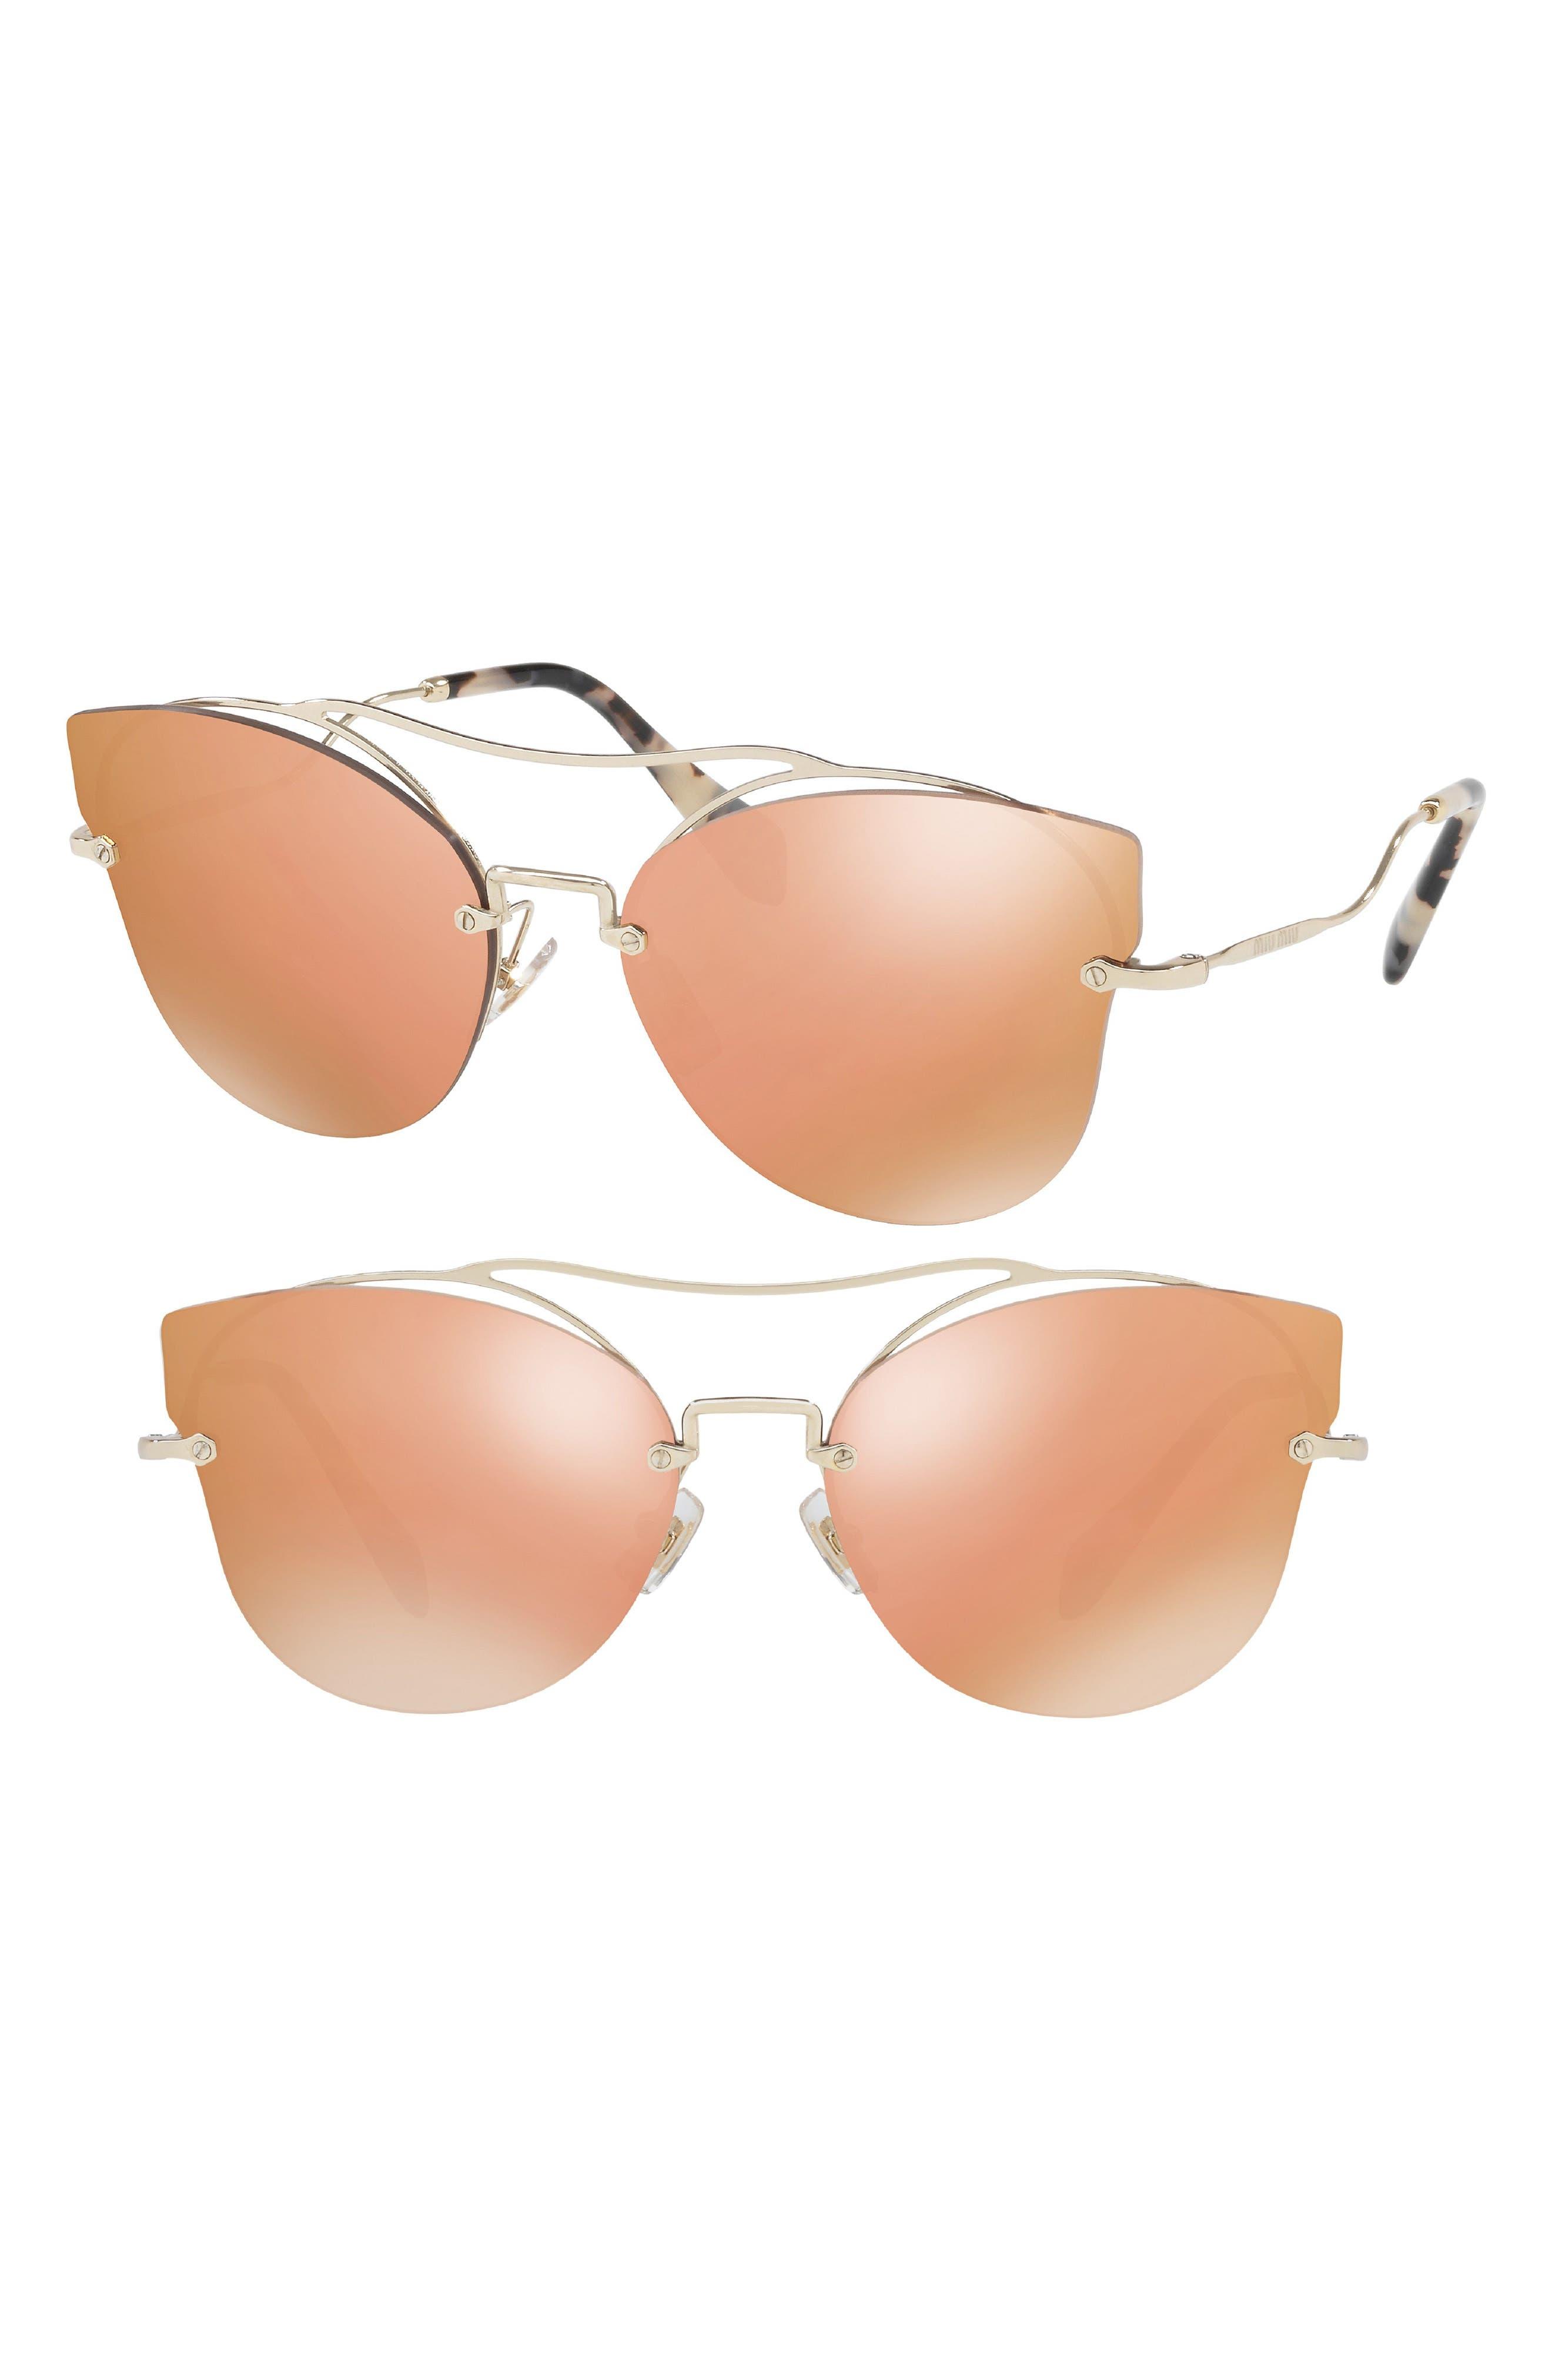 62mm Aviator Sunglasses,                         Main,                         color, Gold/ Pink Mirror